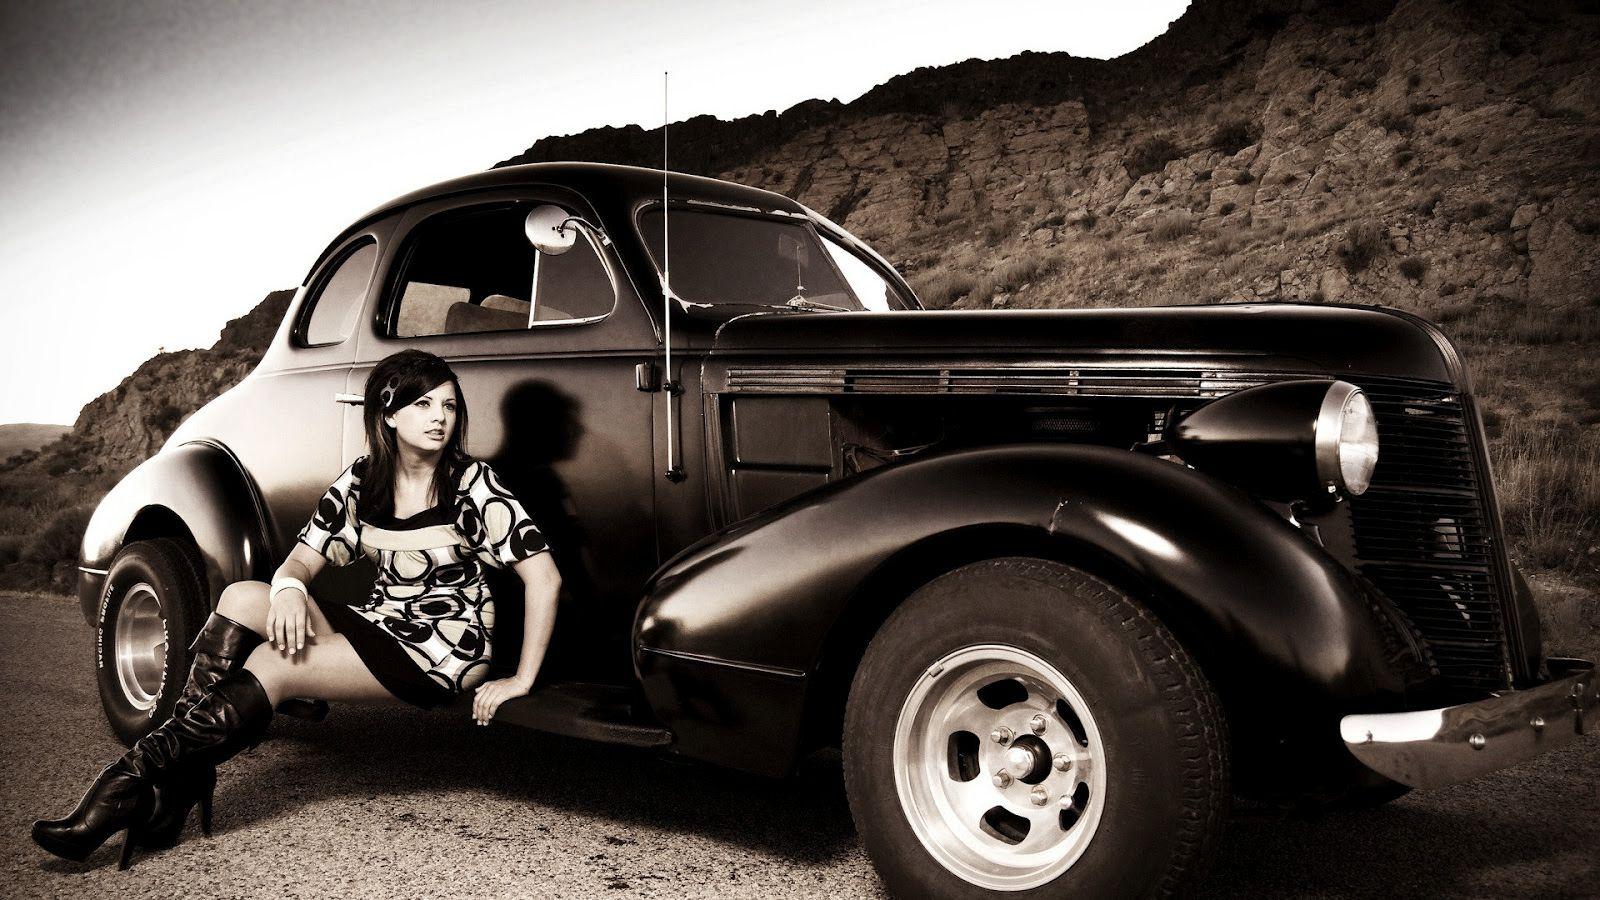 Vintage - Visit our website at: http://revol.com.sg | Revol Carz ...